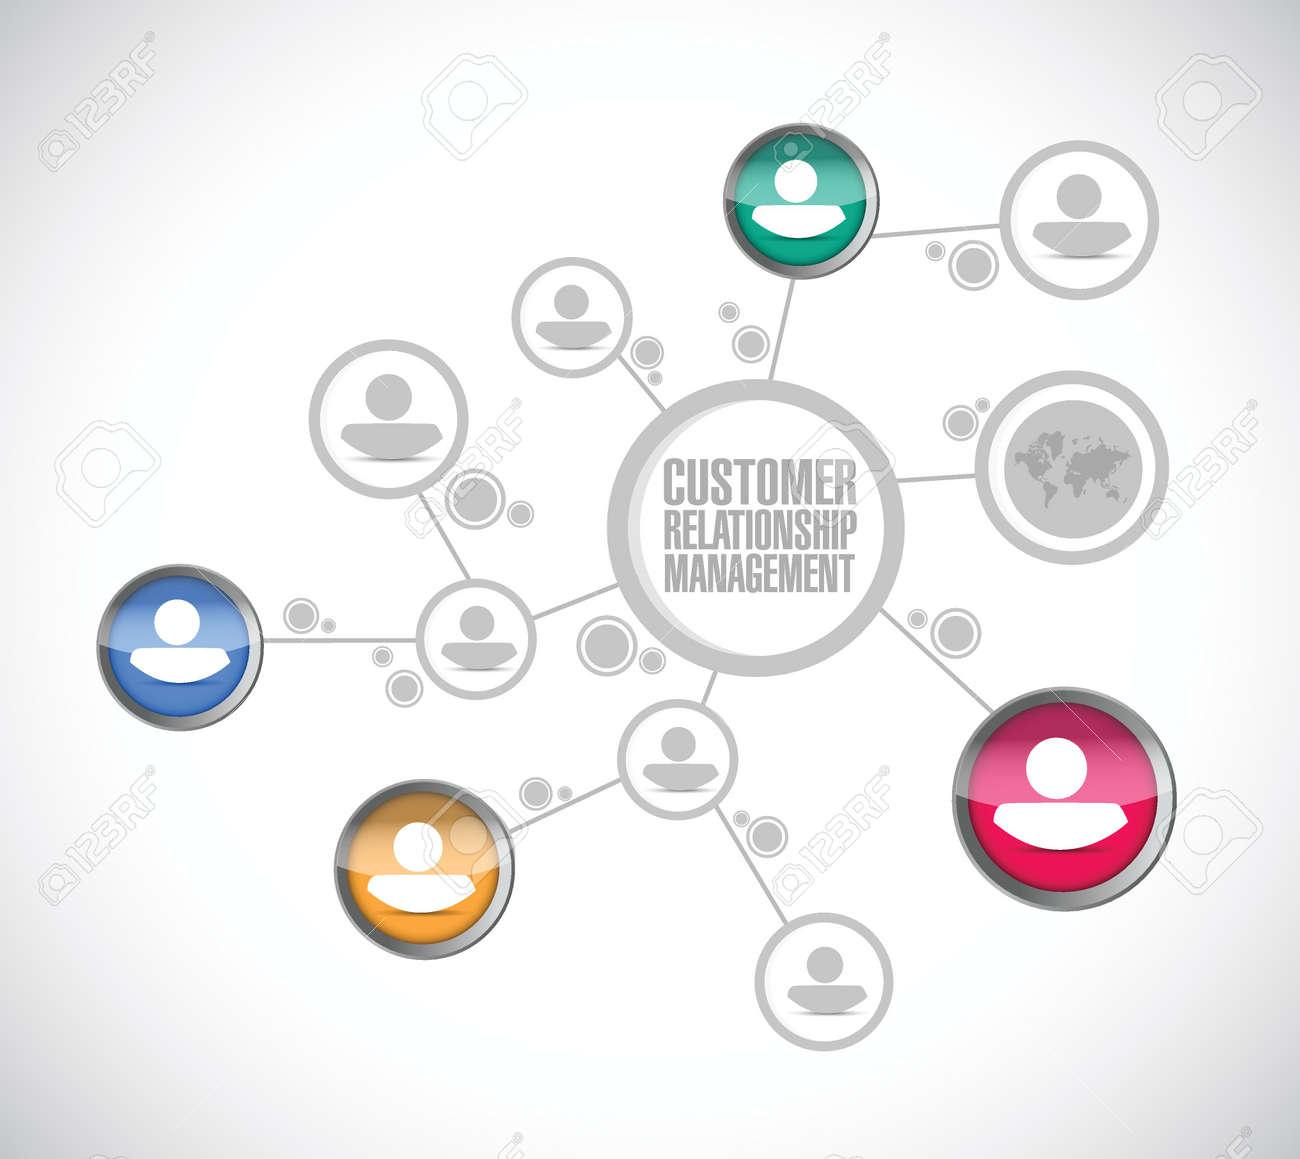 Customer Relationship Management Business Diagram Illustration